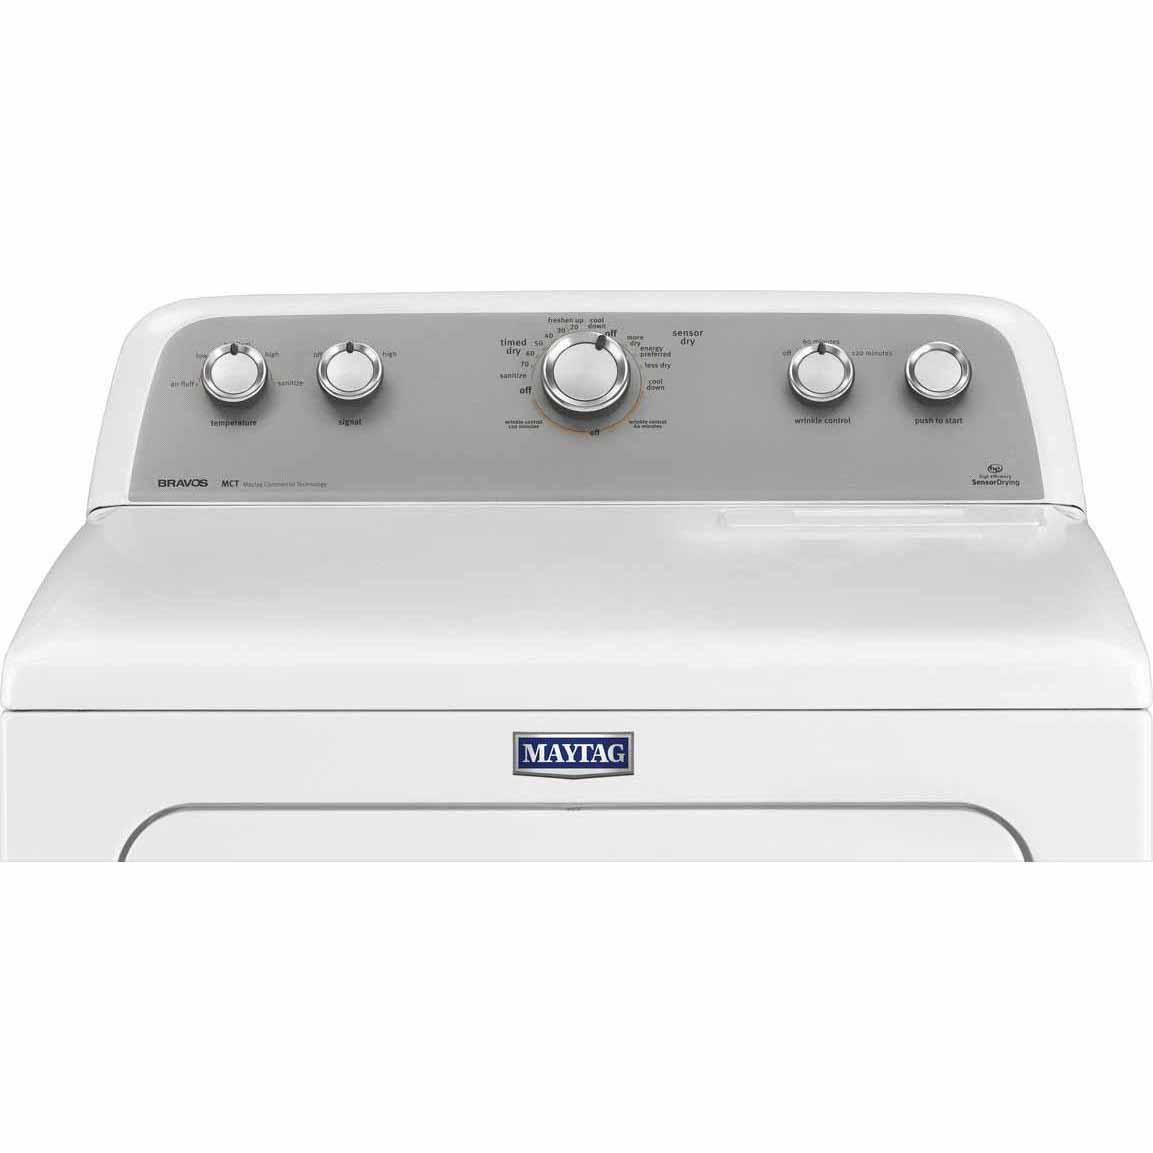 Maytag MEDX655DW 7.0 cu. ft. Bravos® Electric Dryer w/ Sanitize Cycle - White